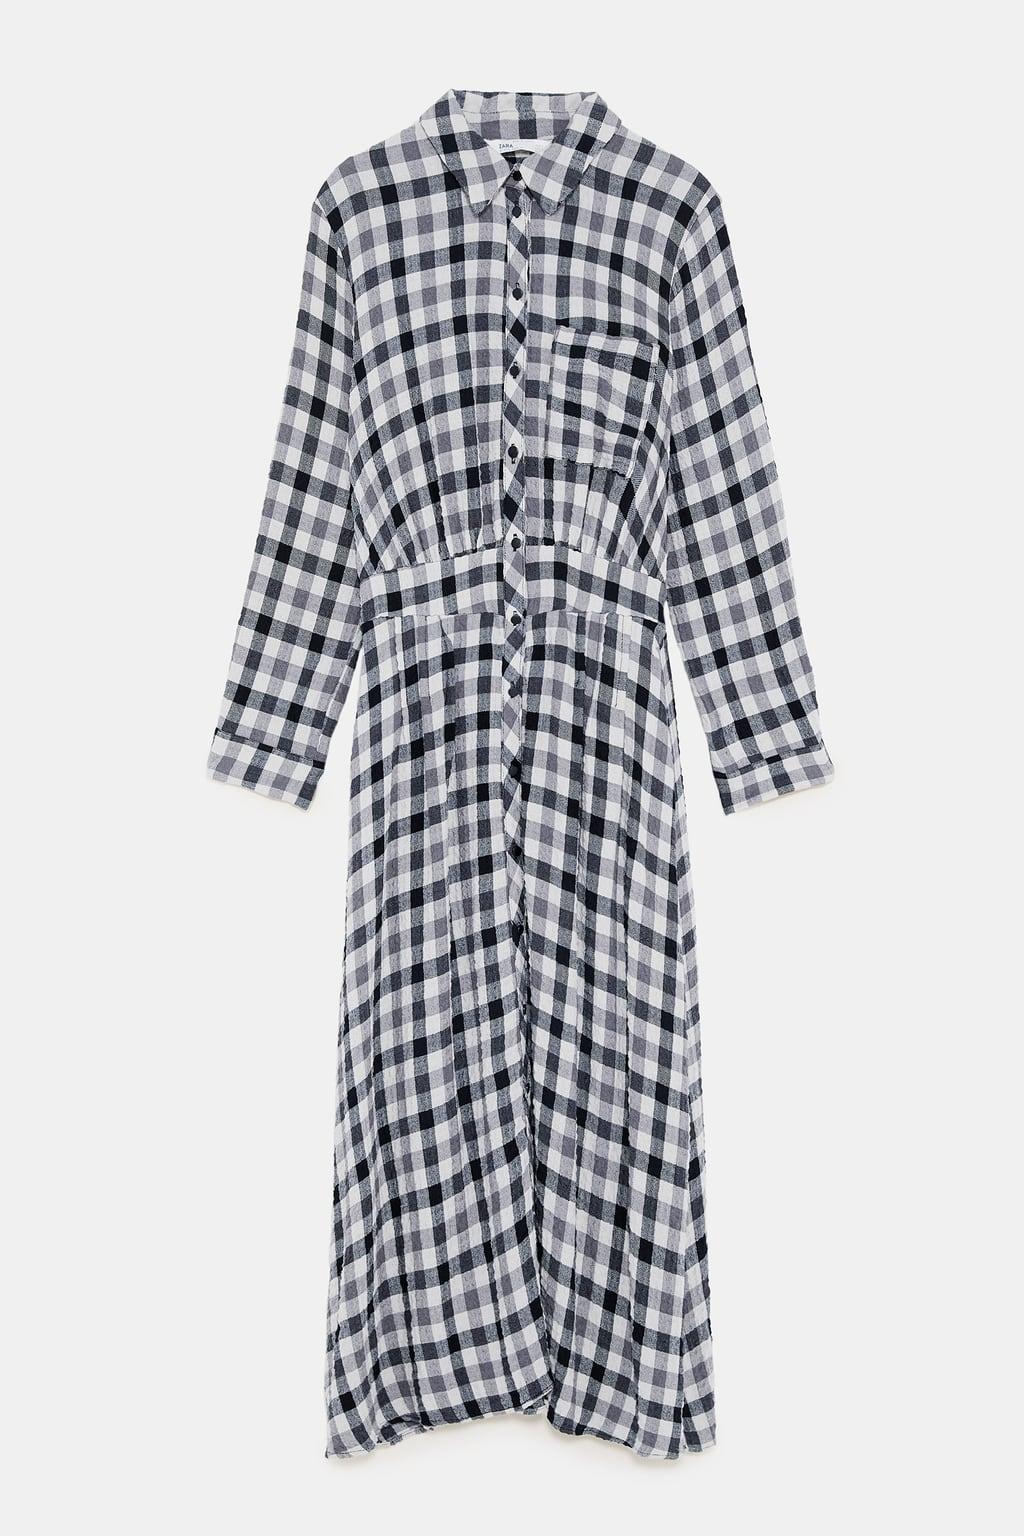 H Sienna Miller με φόρεμα Zara Αν θες να αντιγράψεις το στυλ της ηθοποιού, τρέξε να το προλάβεις.